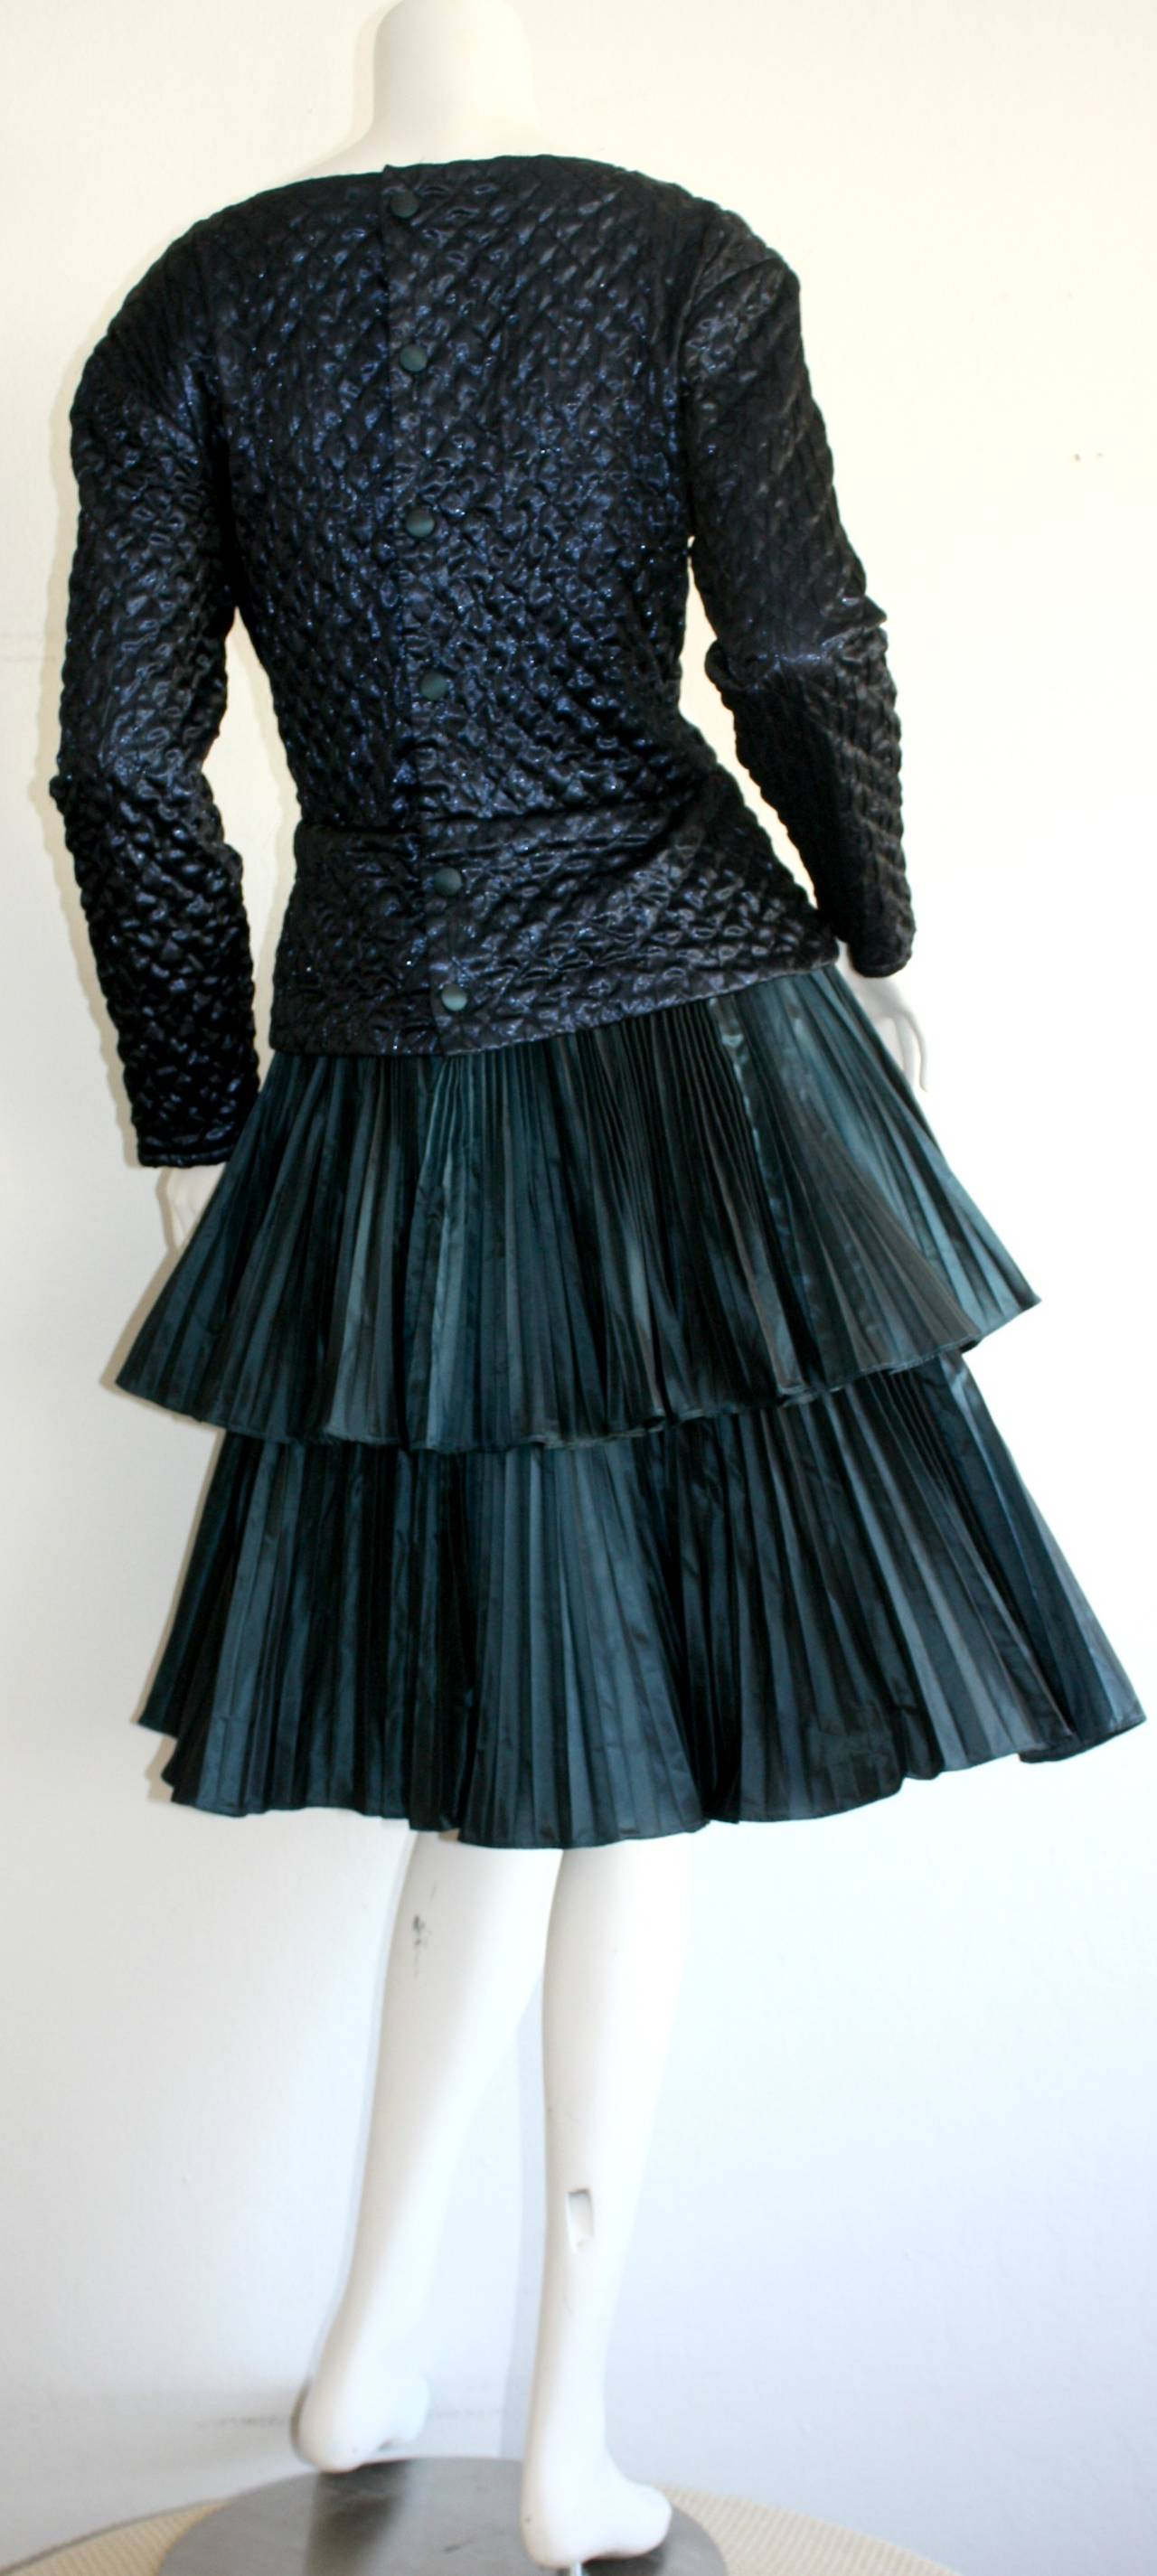 Women's Bernard Perris Beautiful Navy Blue Metallic Quilted Accordion Tiered Dress For Sale